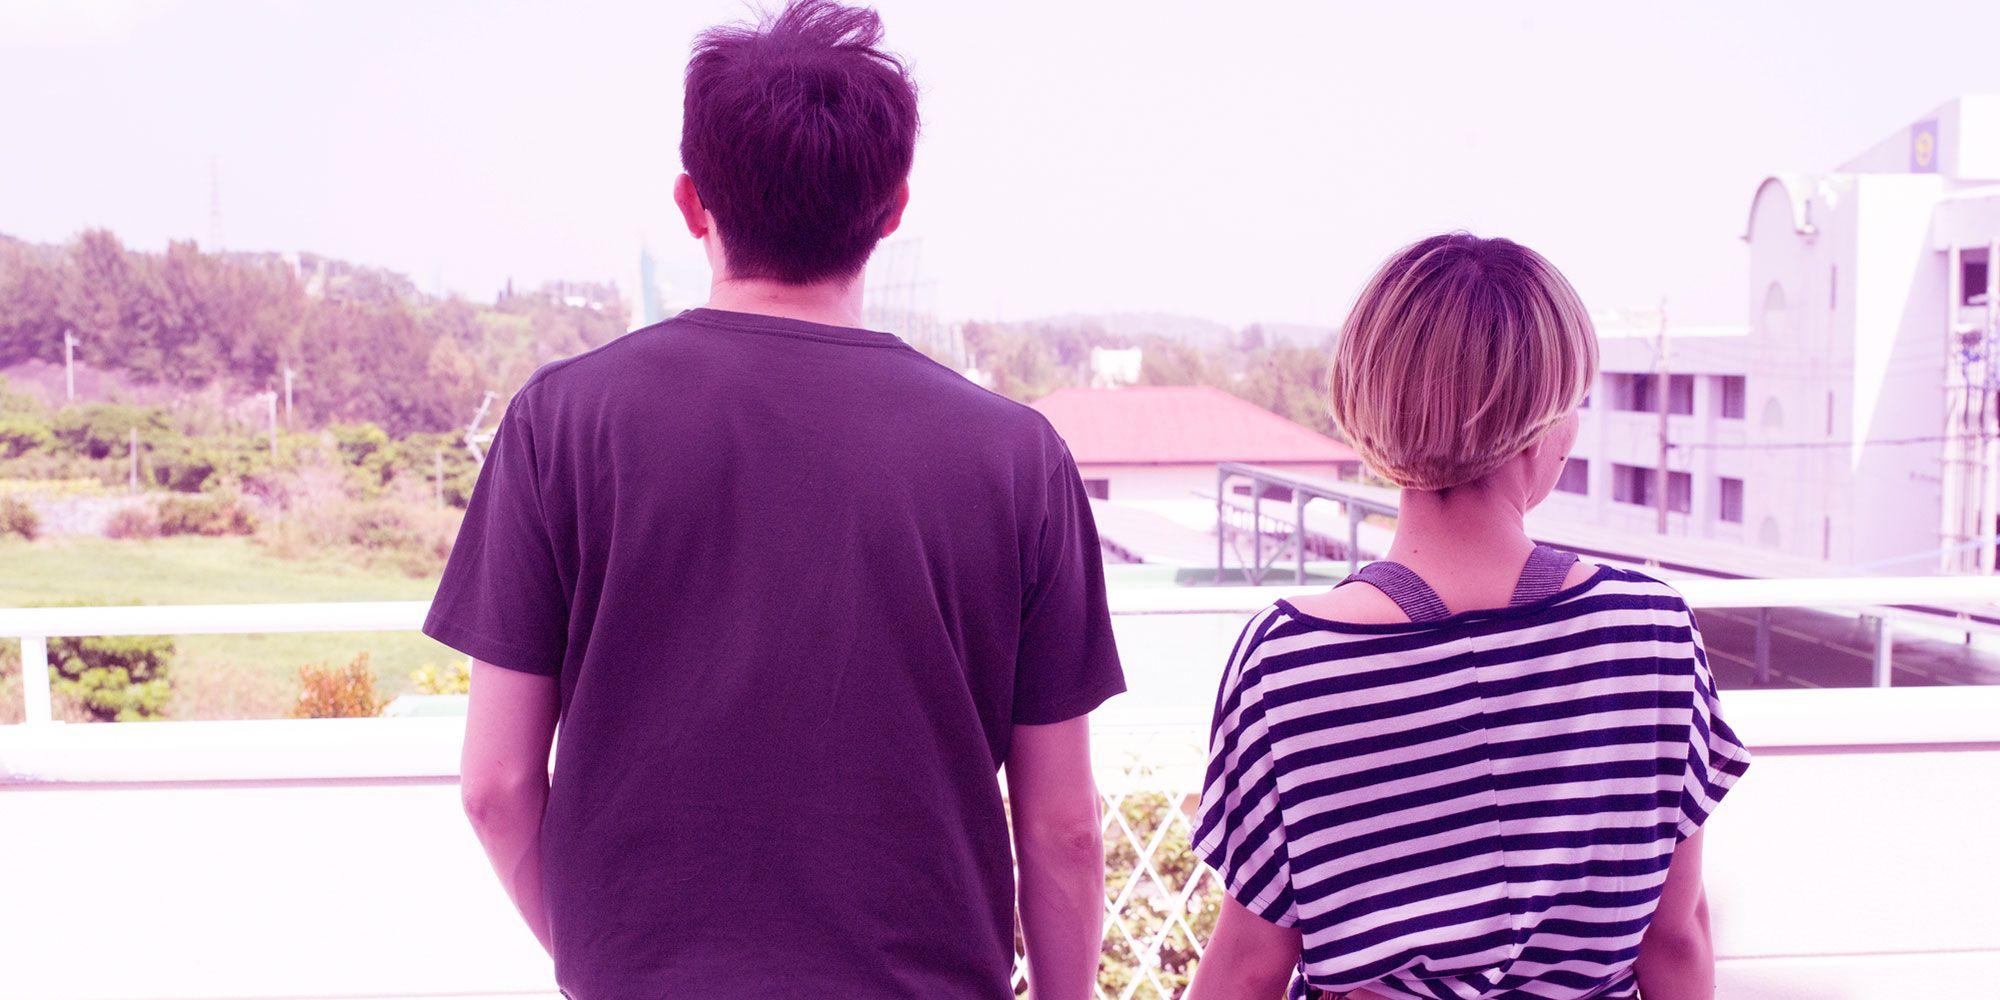 Polyamory open relationship advice